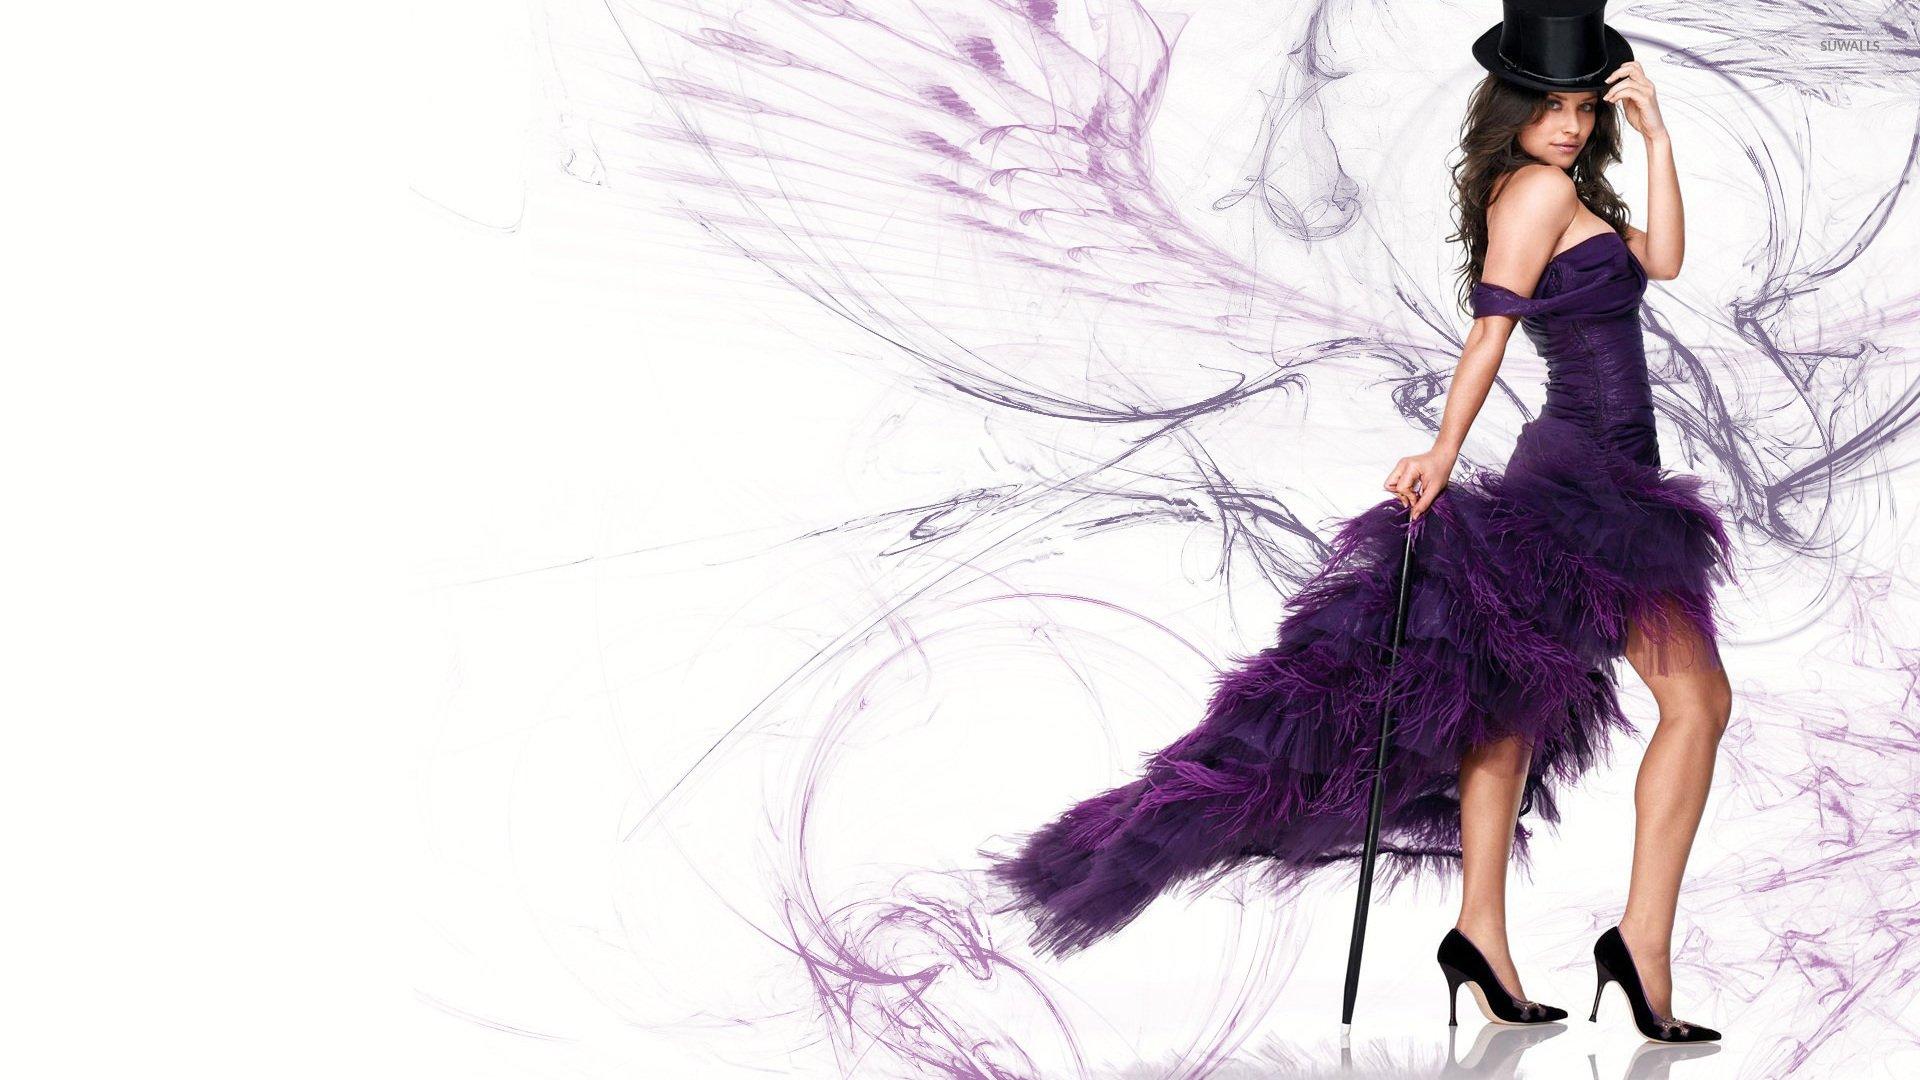 Evangeline Lilly wallpaper 1920x1080 1920x1080